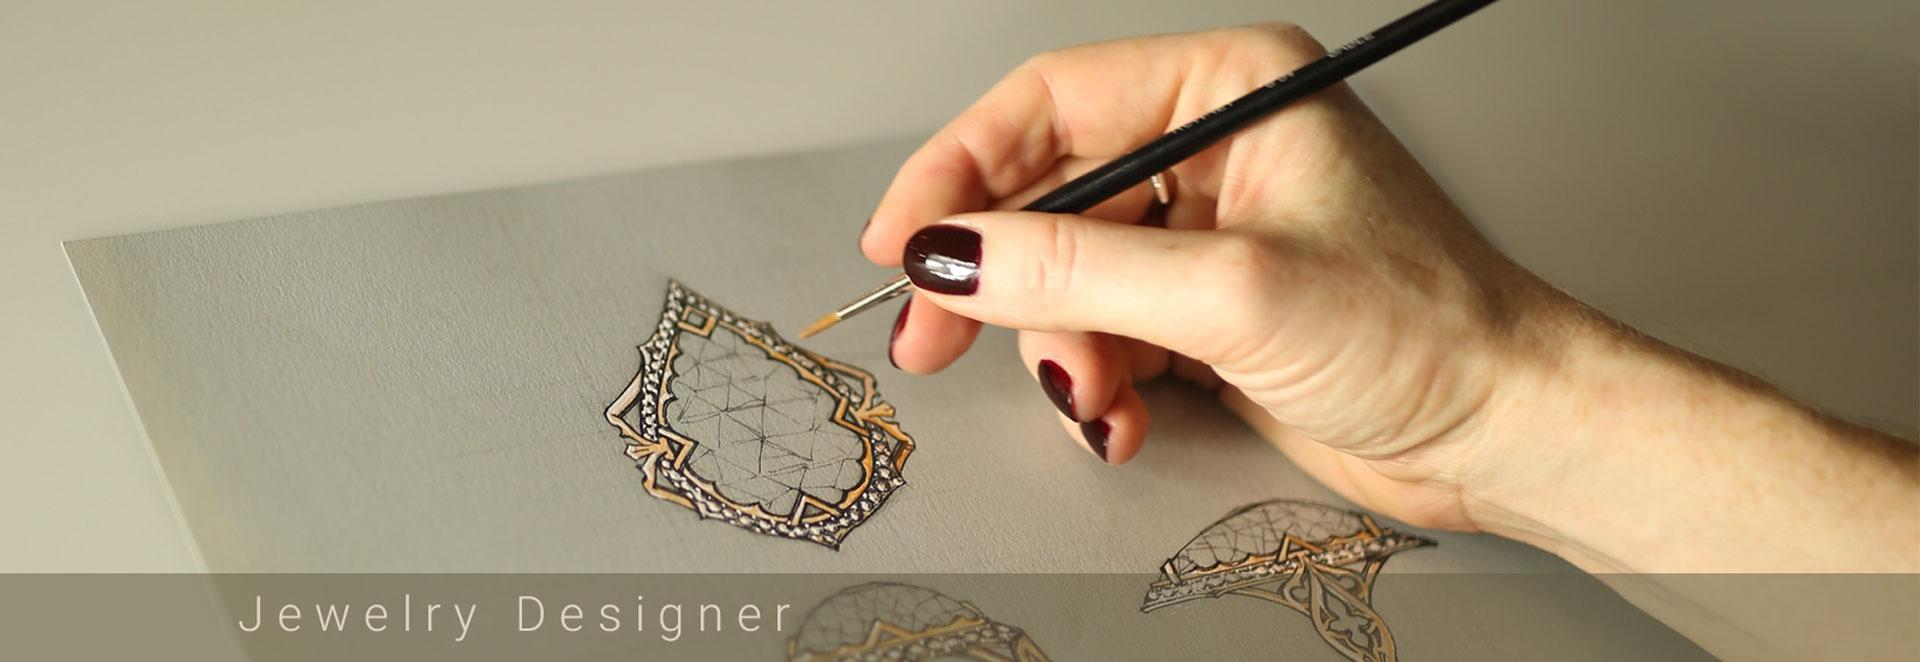 طراح جواهر